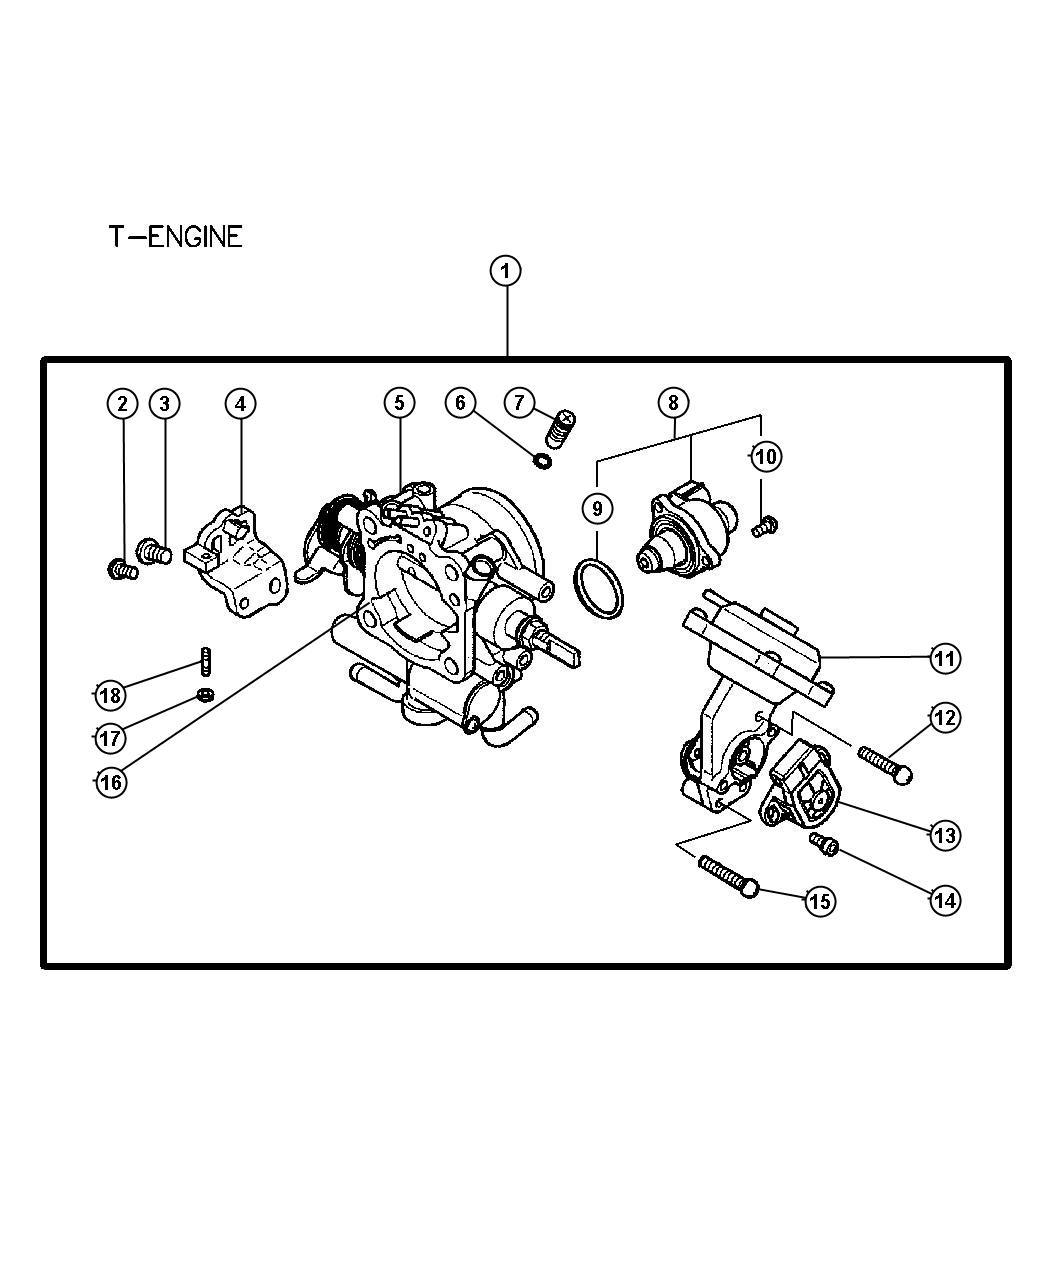 2002 Dodge Stratus Sensor. Throttle position. Mmc, body